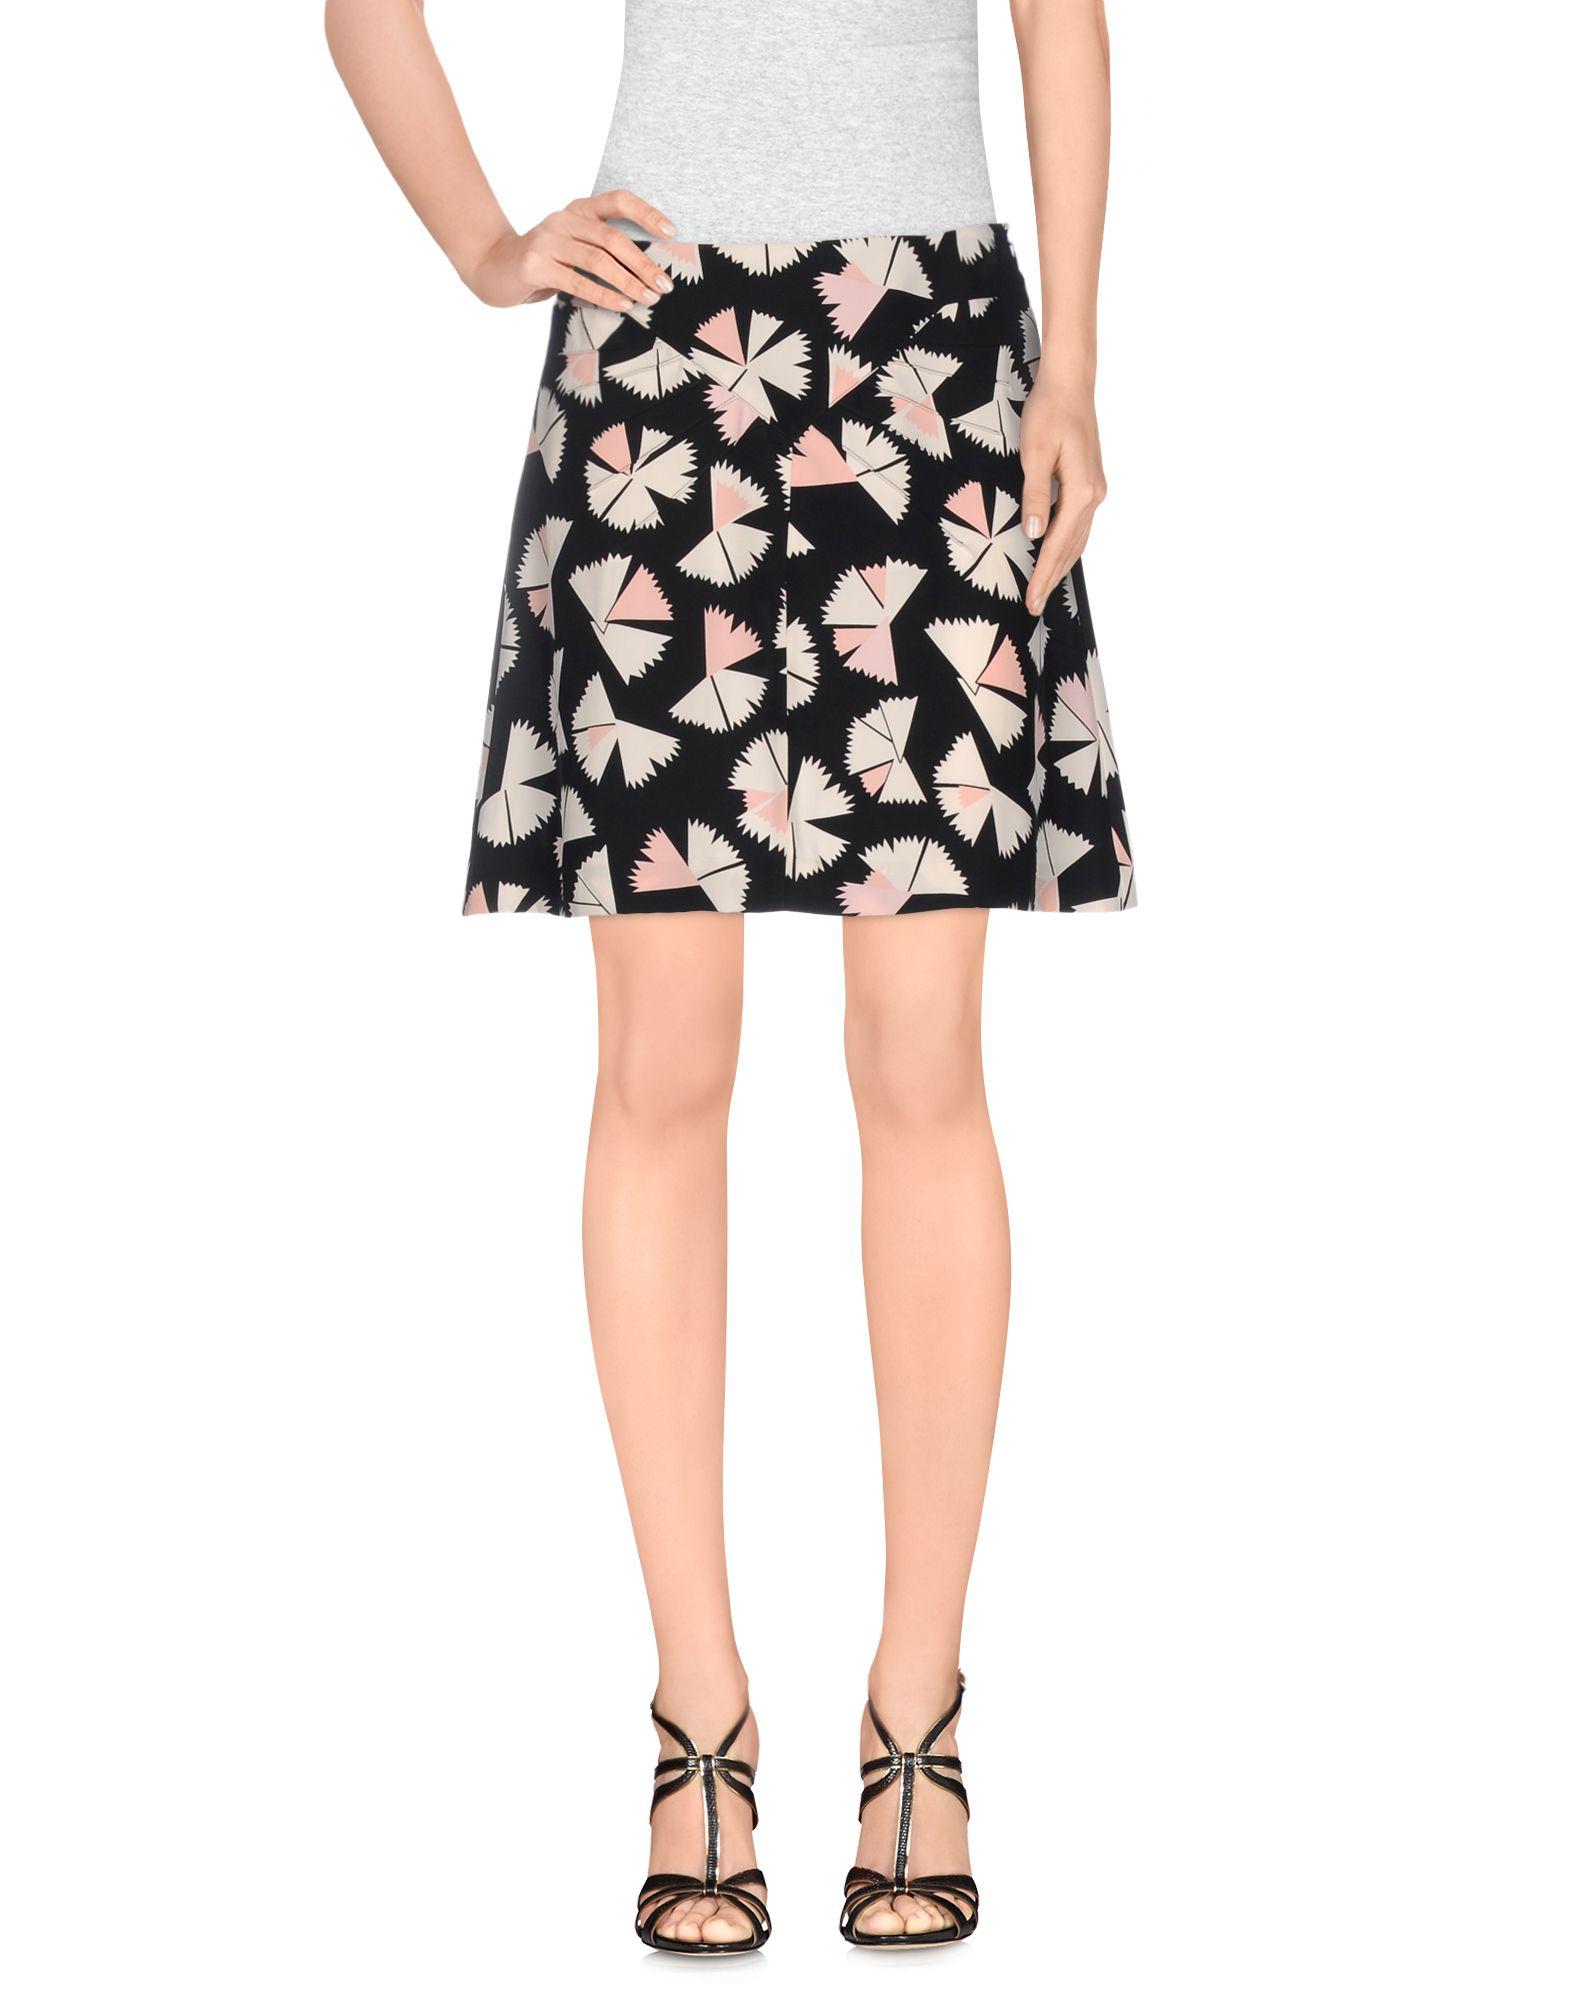 MARC BY MARC JACOBS Мини-юбка marc by marc jacobs юбка с контрастной отделкой